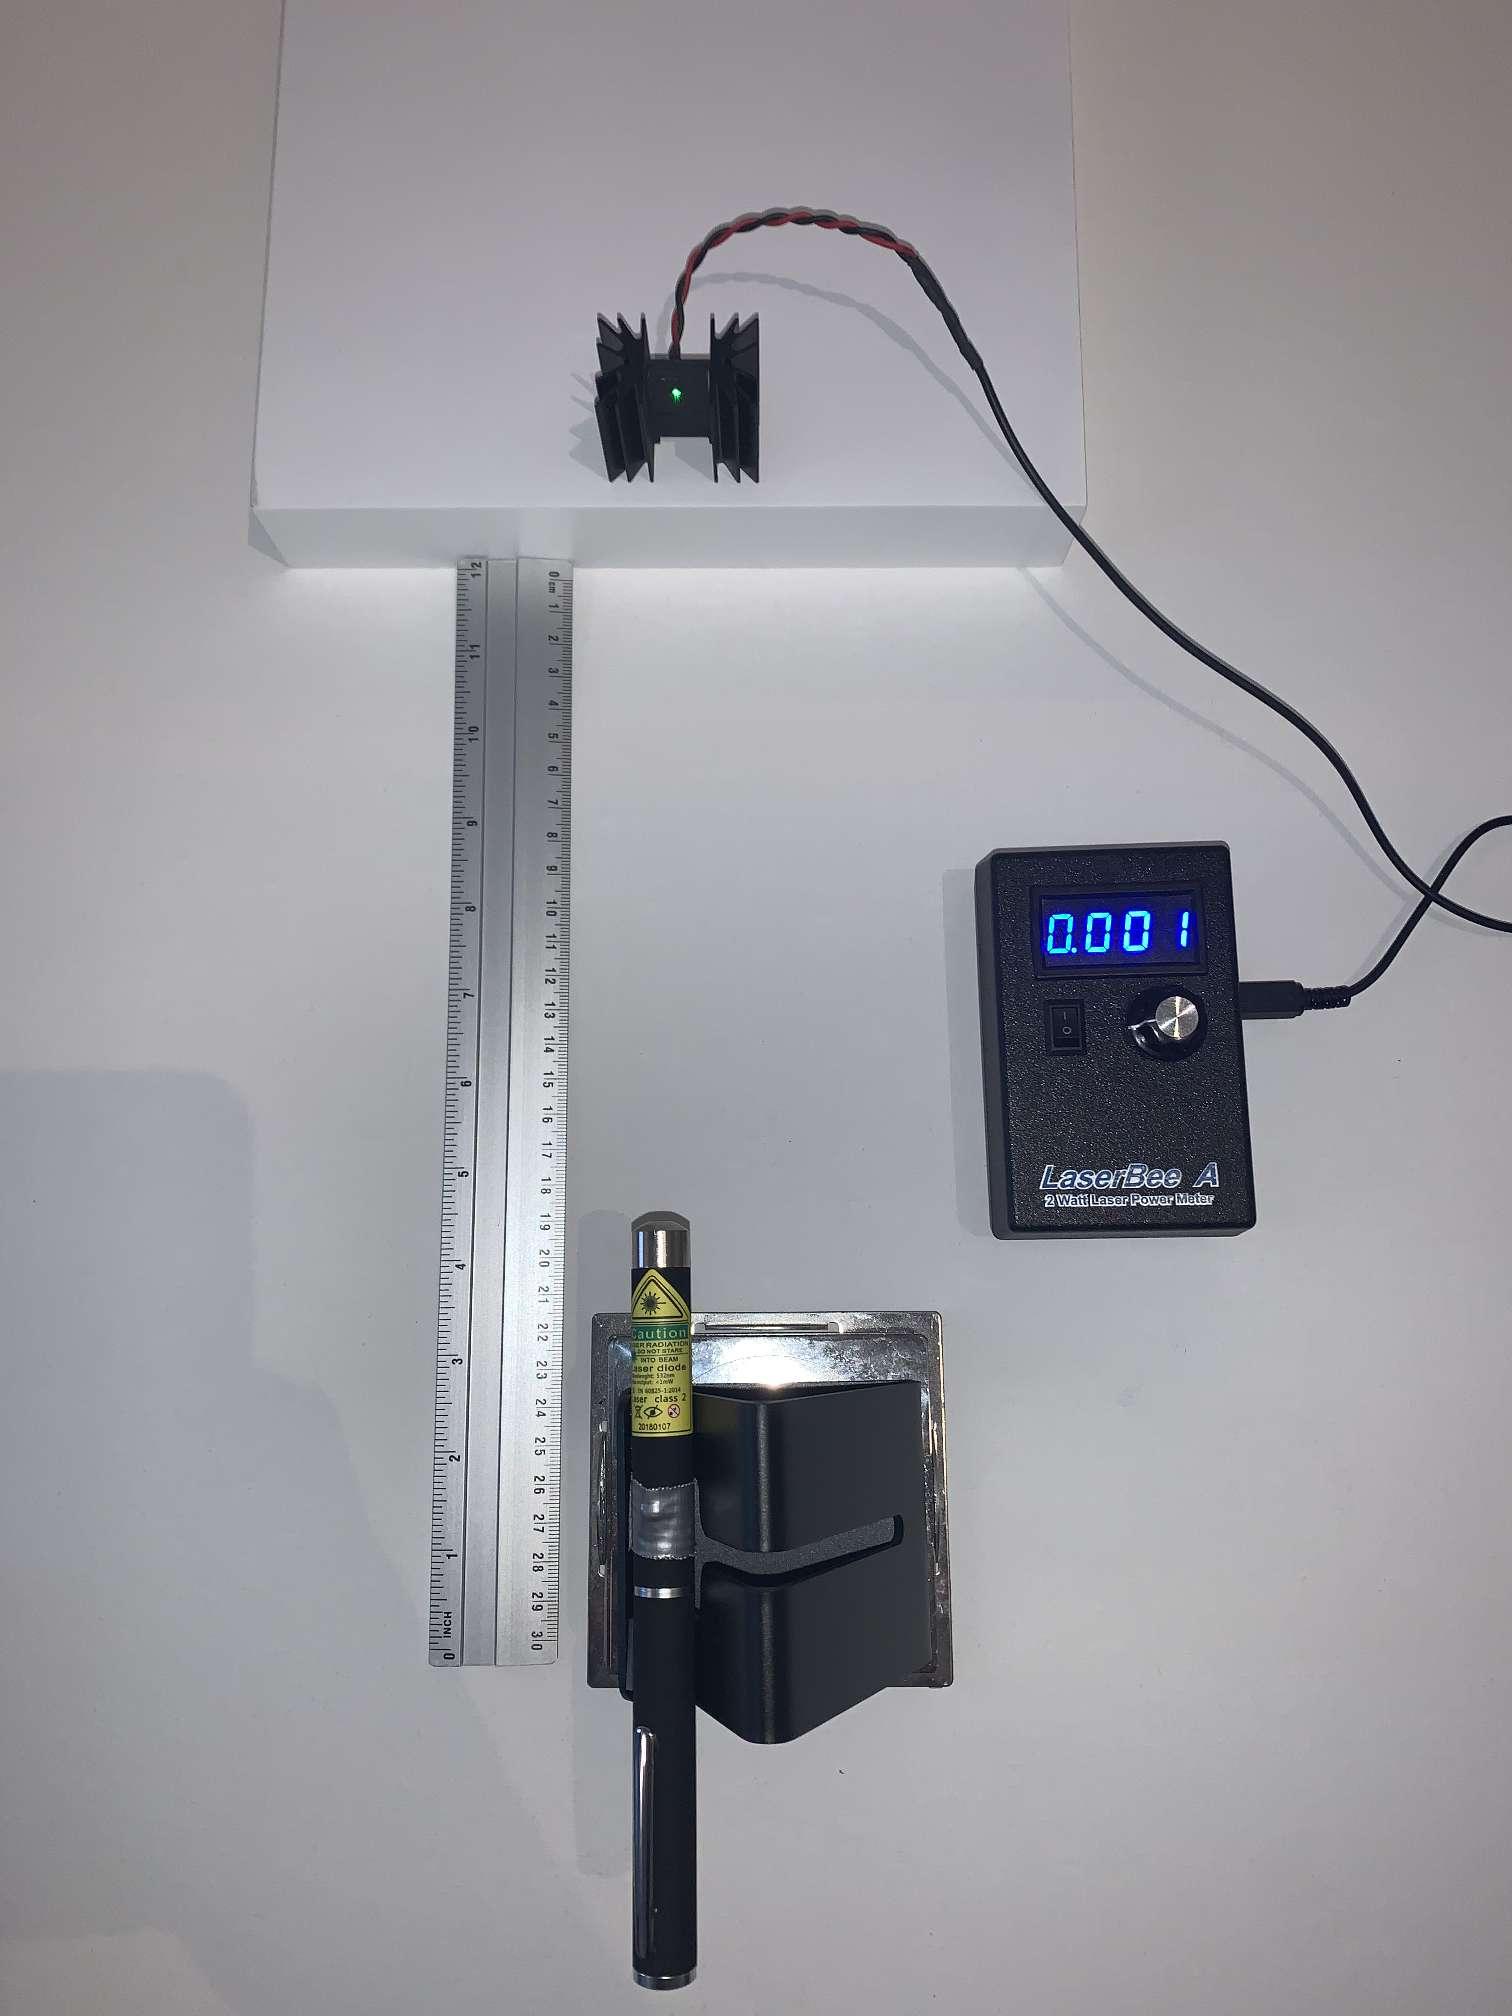 legal laserpointer